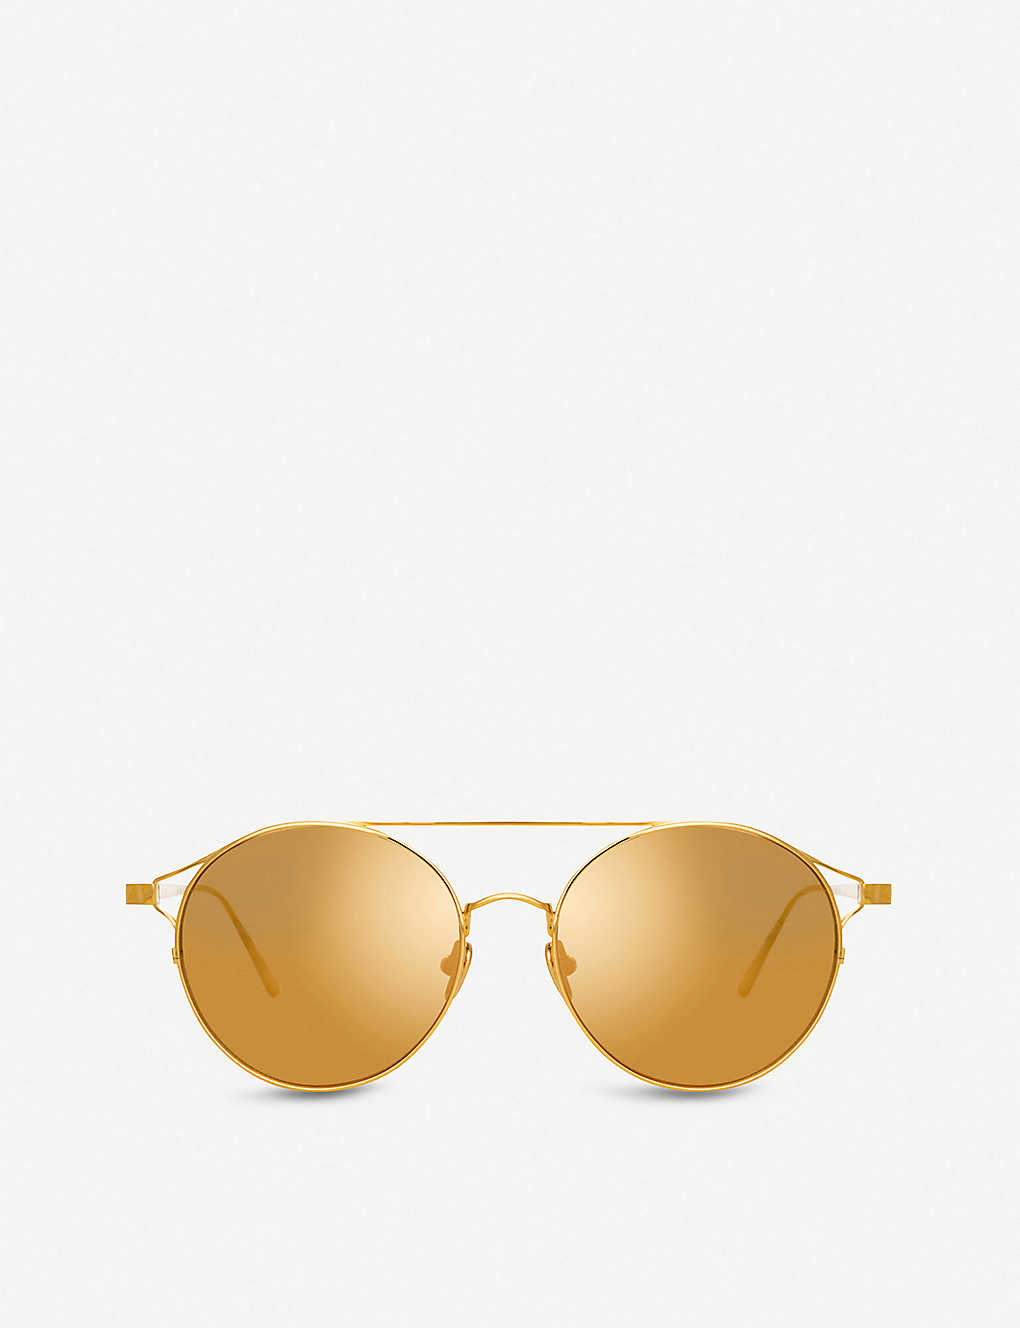 236b806a5c LINDA FARROW - 426 C1 gold-plated aviator sunglasses